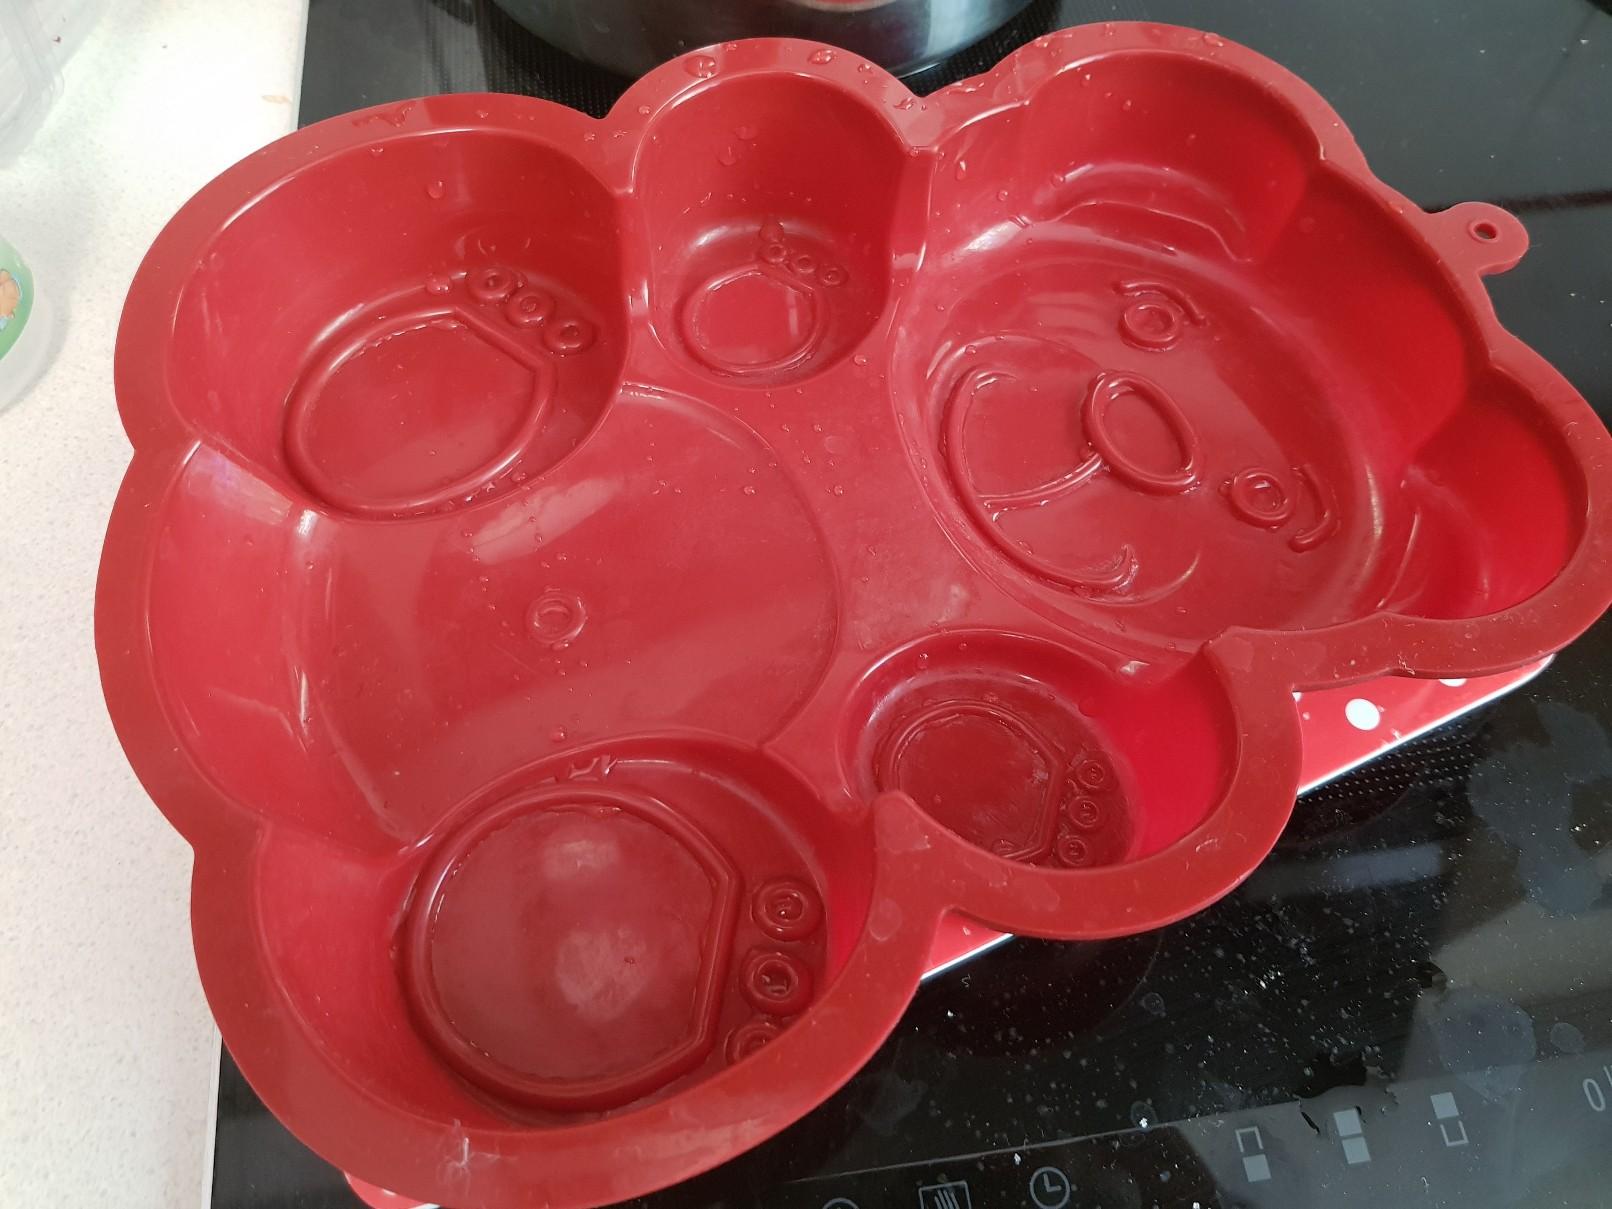 great gummi jelly form